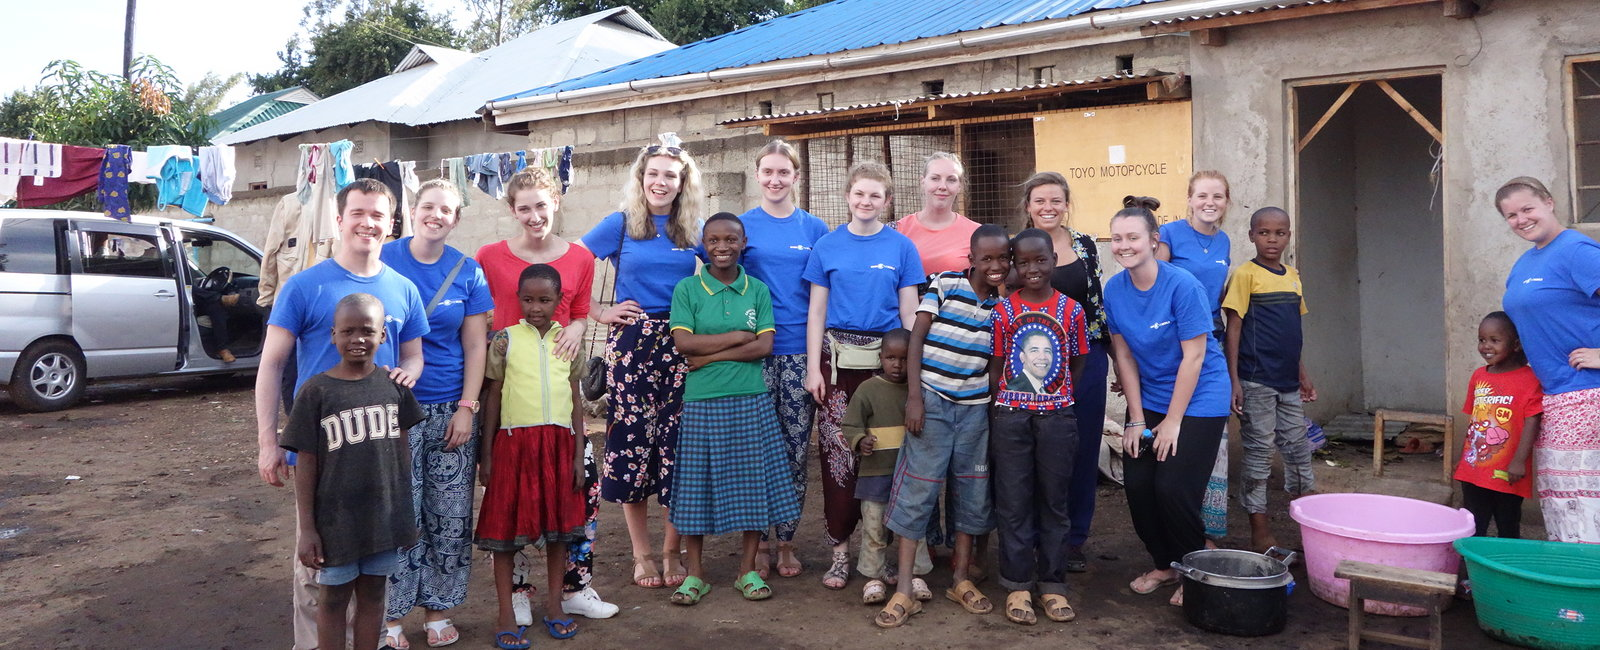 Kimberley Balsdon - Radiography Electives in Tanzania Dar es Salaam